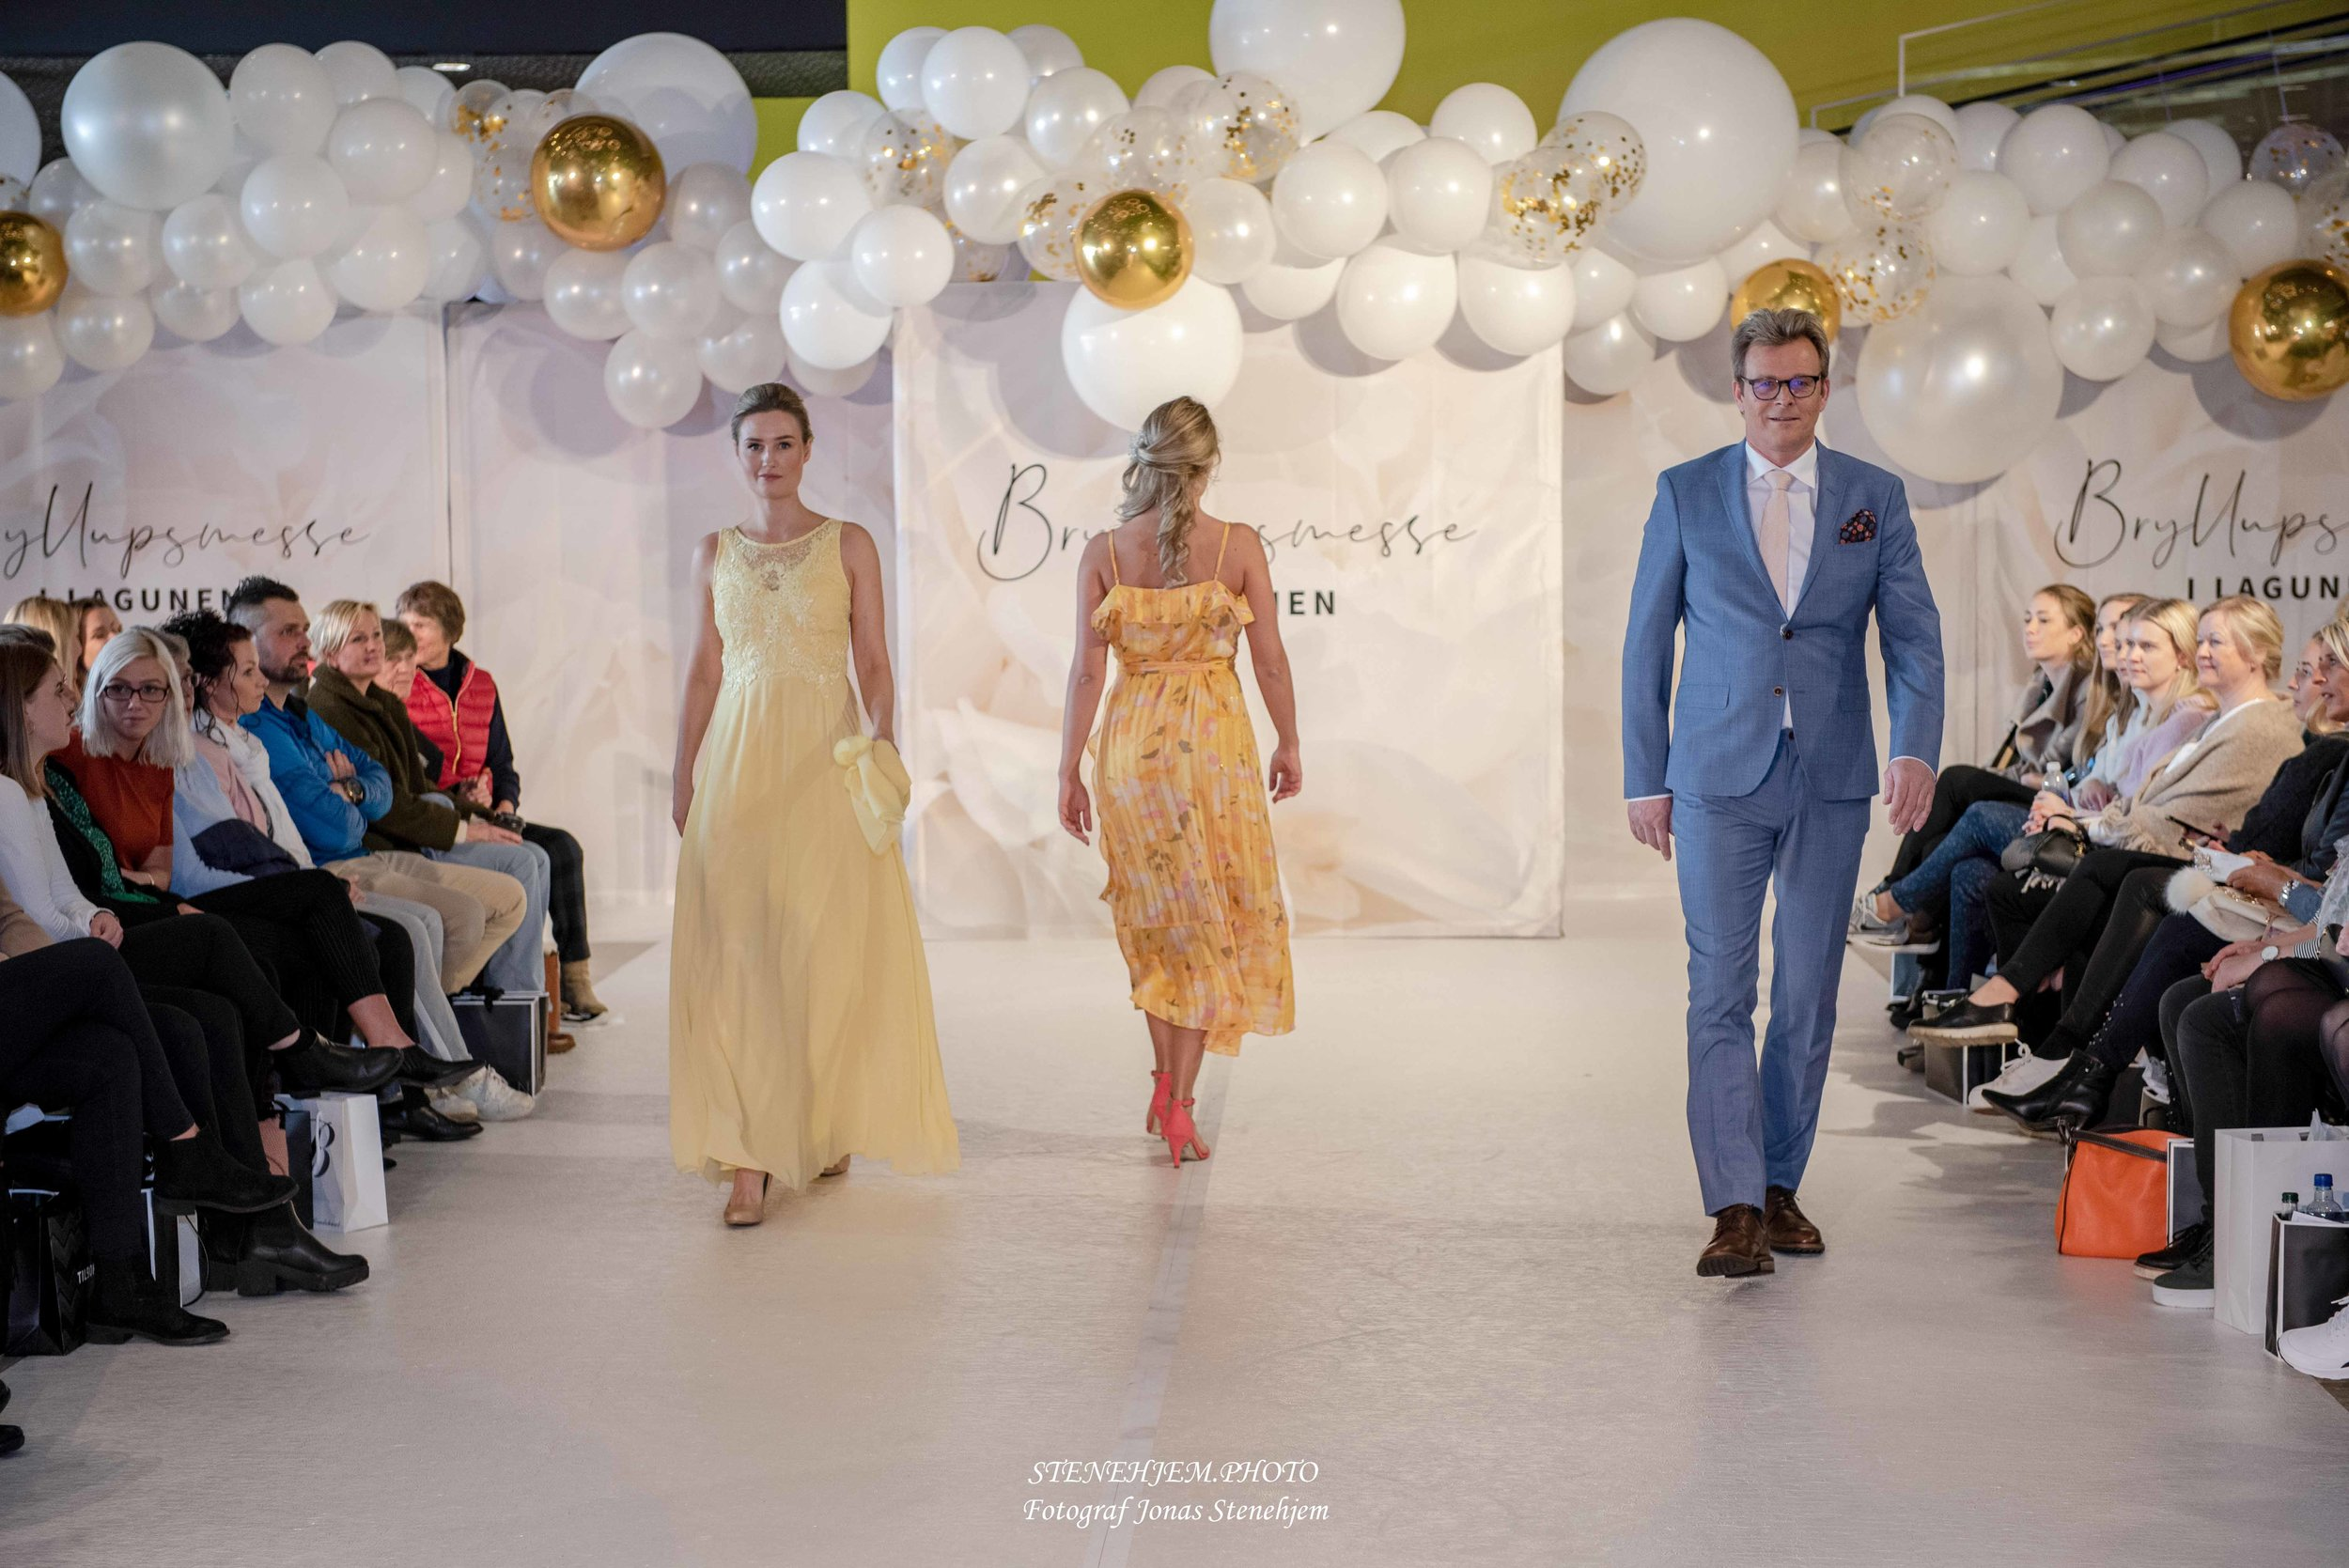 Bryllupsmesse_Lagunen_mittaltweddingfair__066.jpg